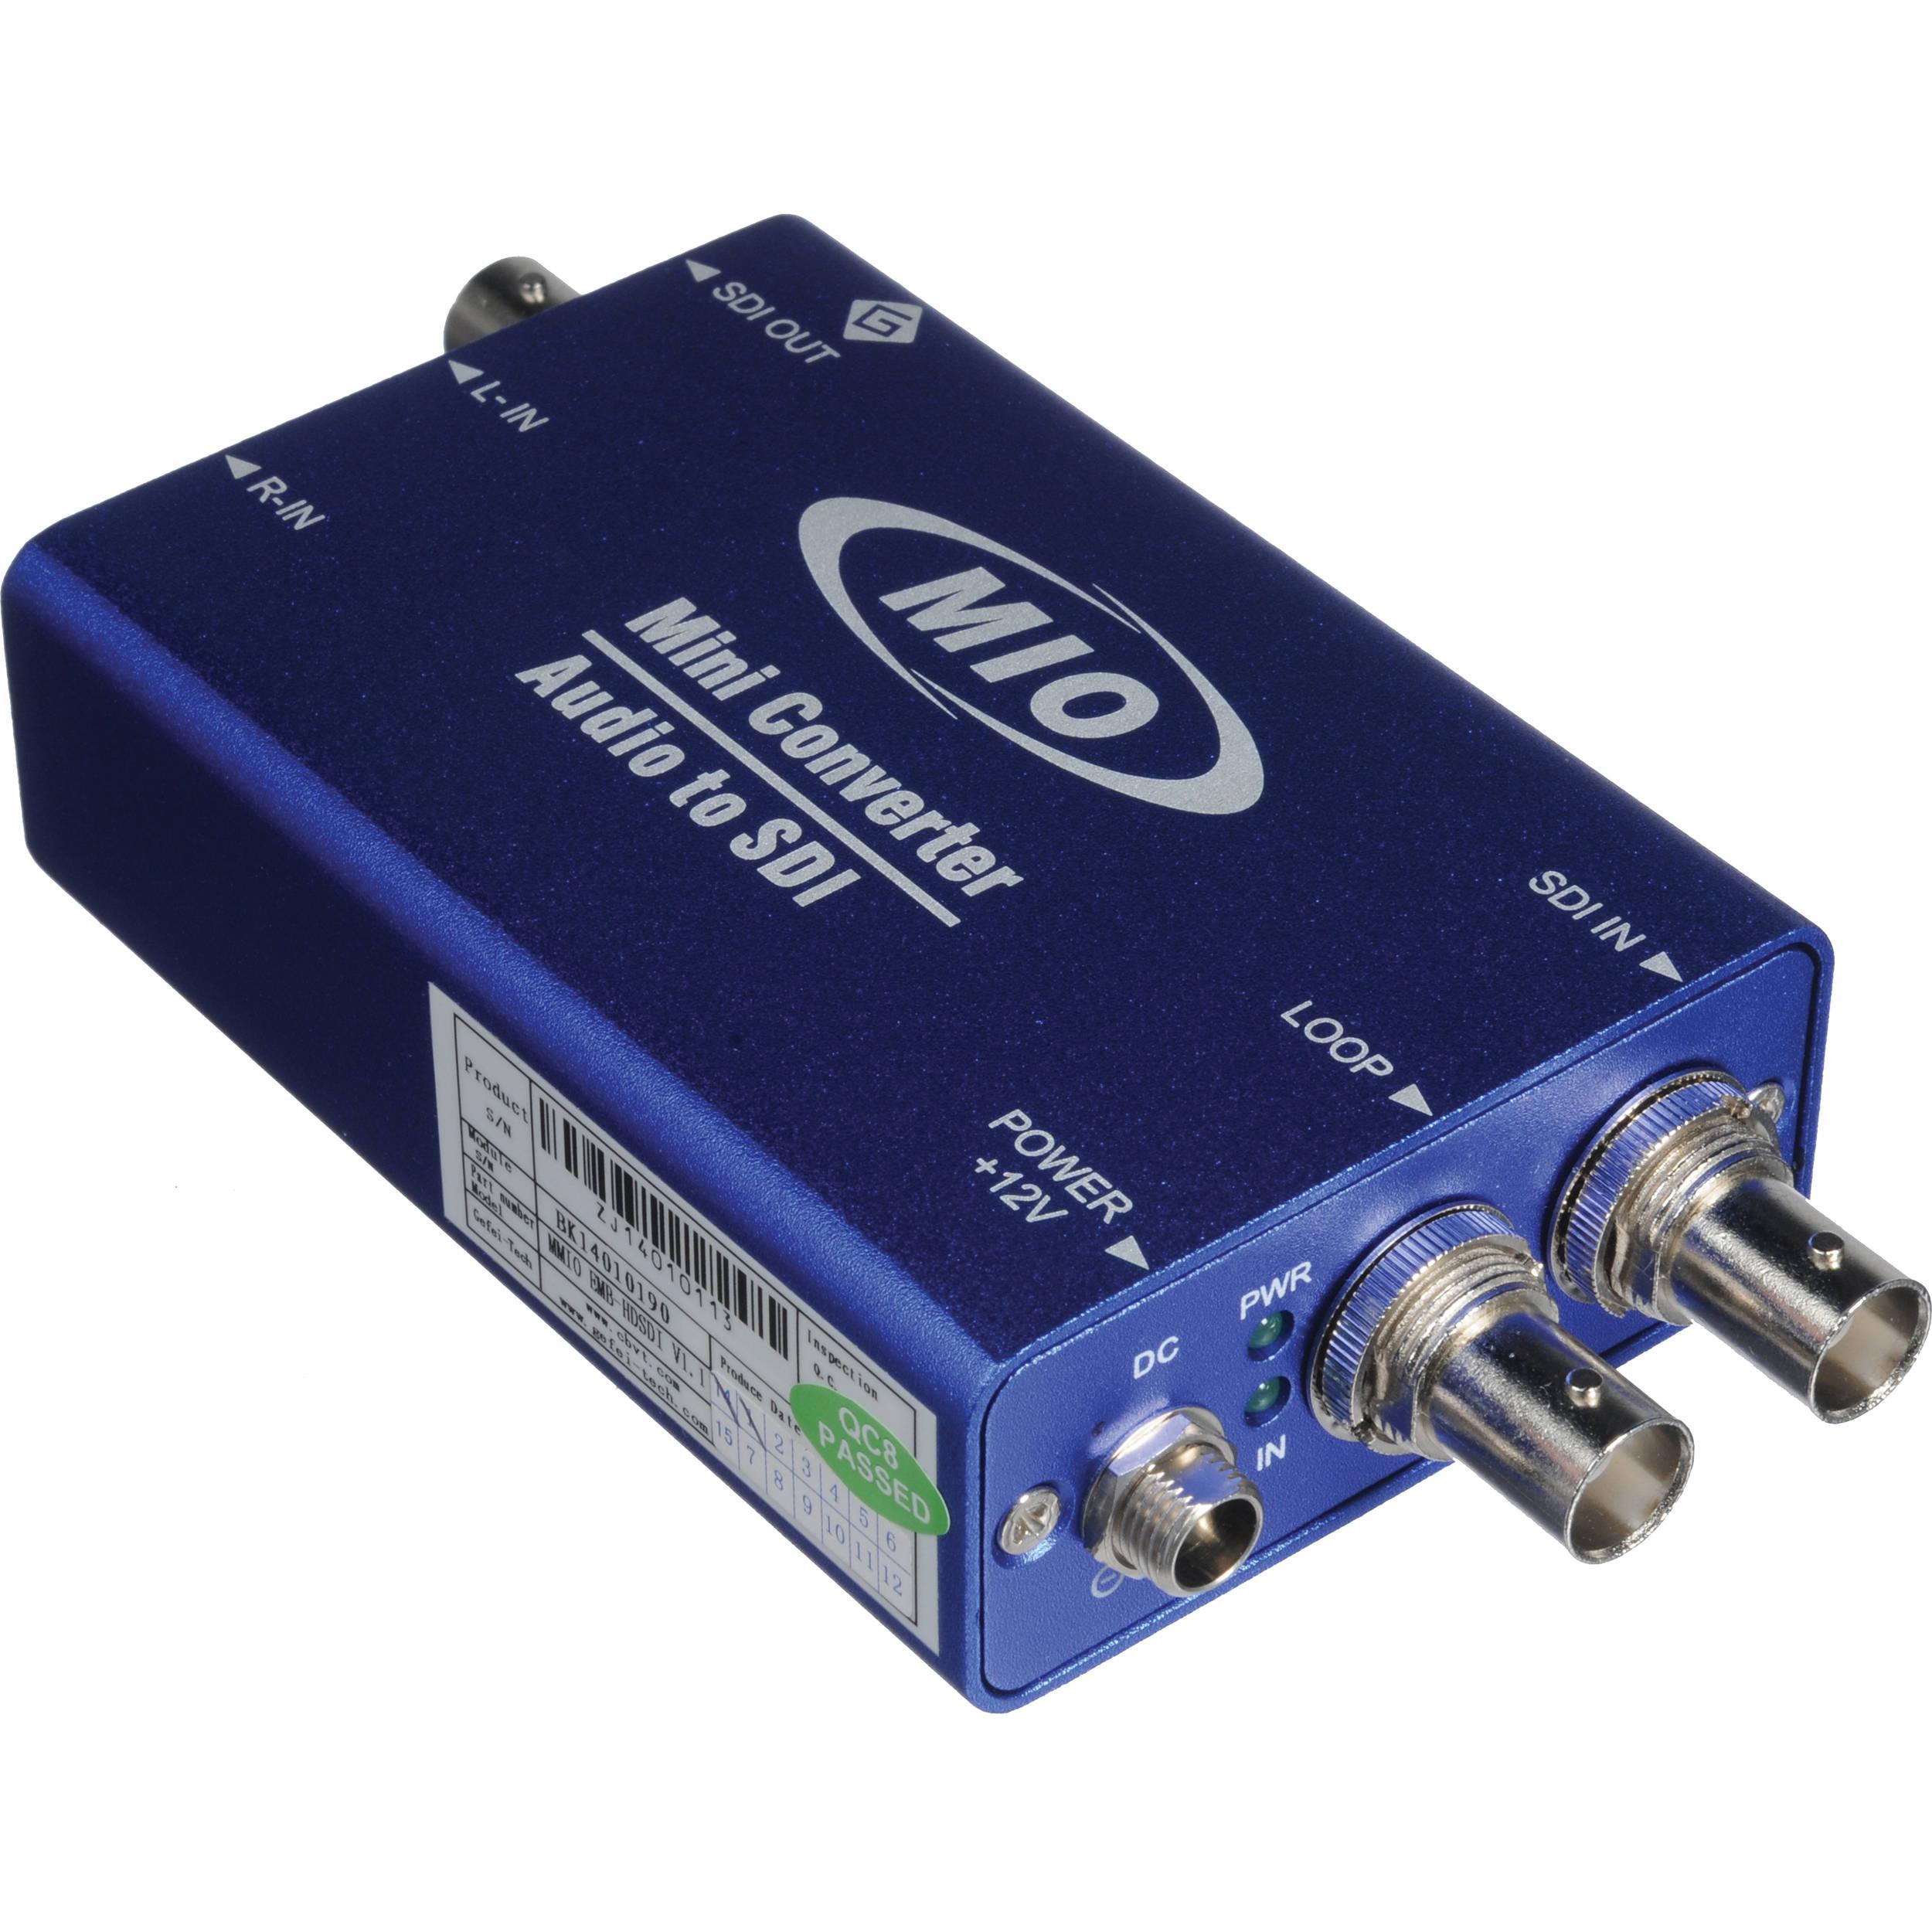 Gra Vue Sdi Stereo Analog Audio Embedder Mmio Emb Hdsdi Bh Current Relay